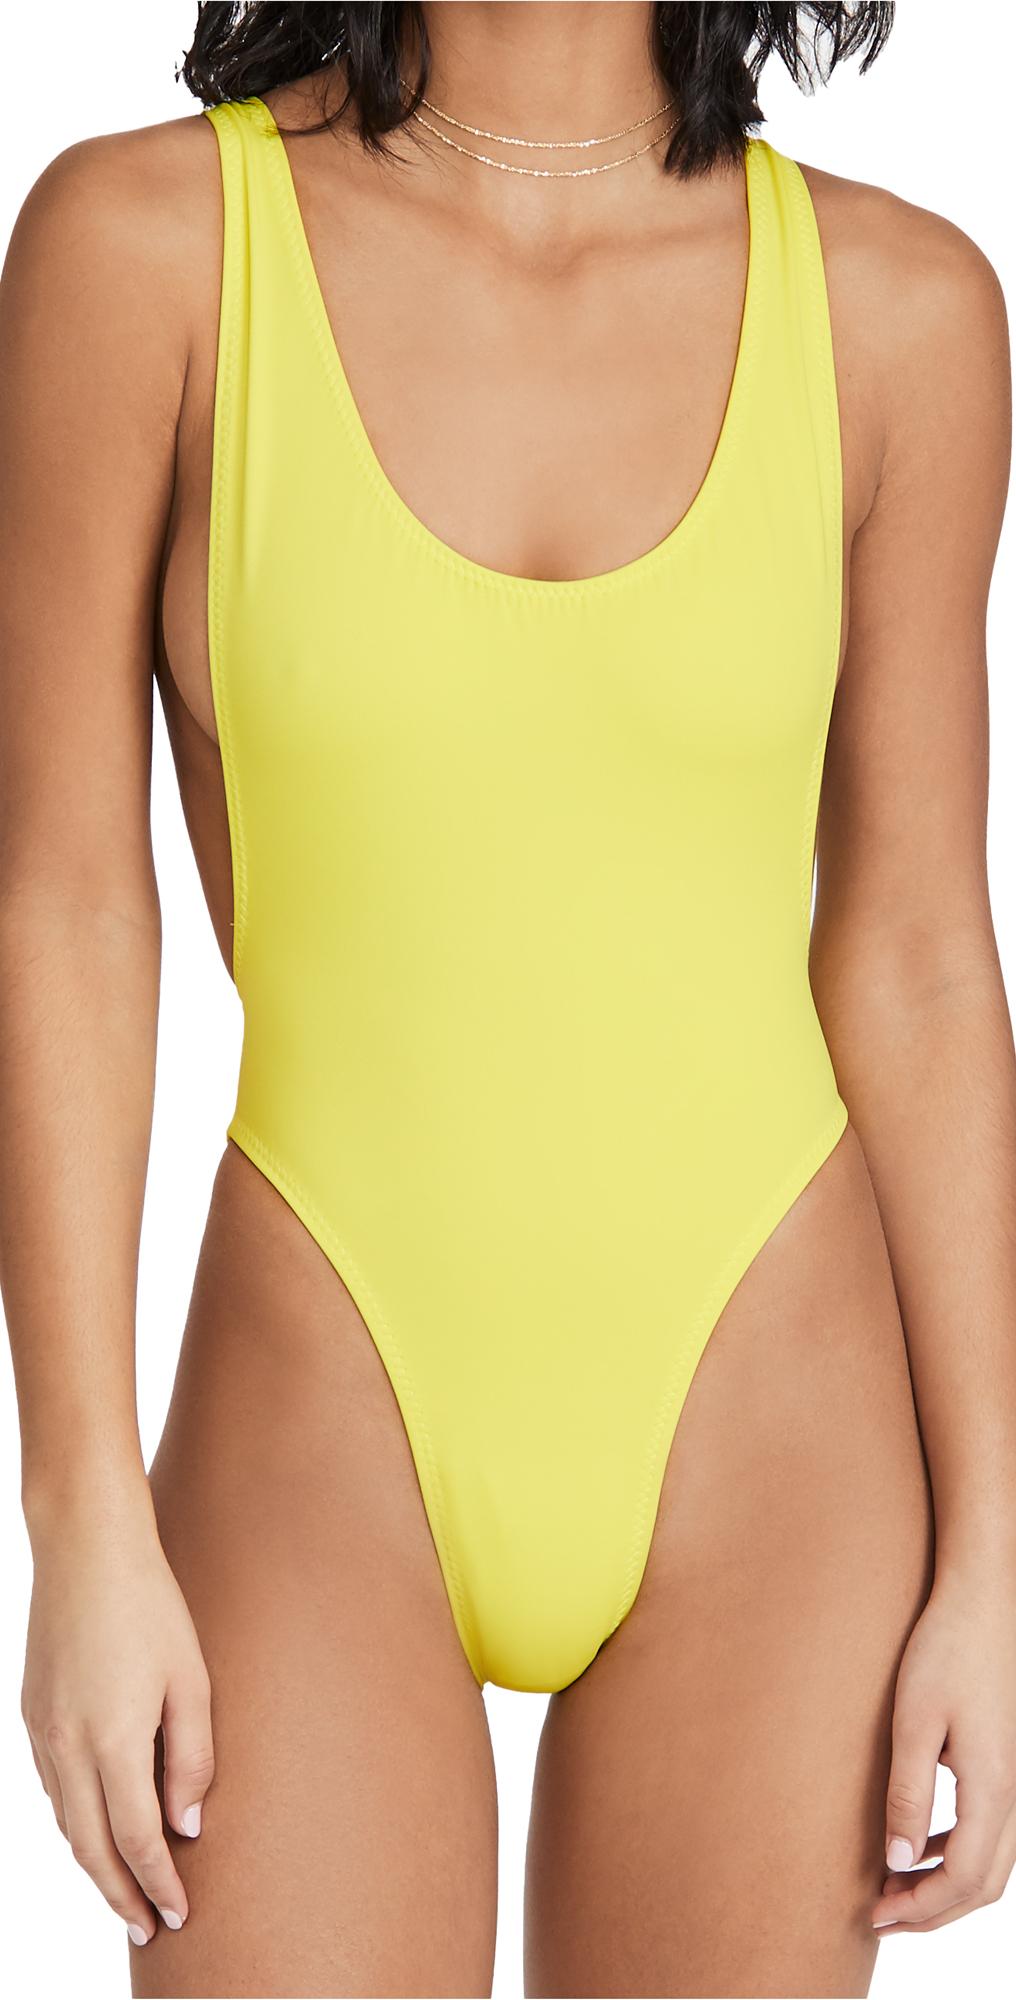 Norma Kamali Marissa One Piece Swimsuit